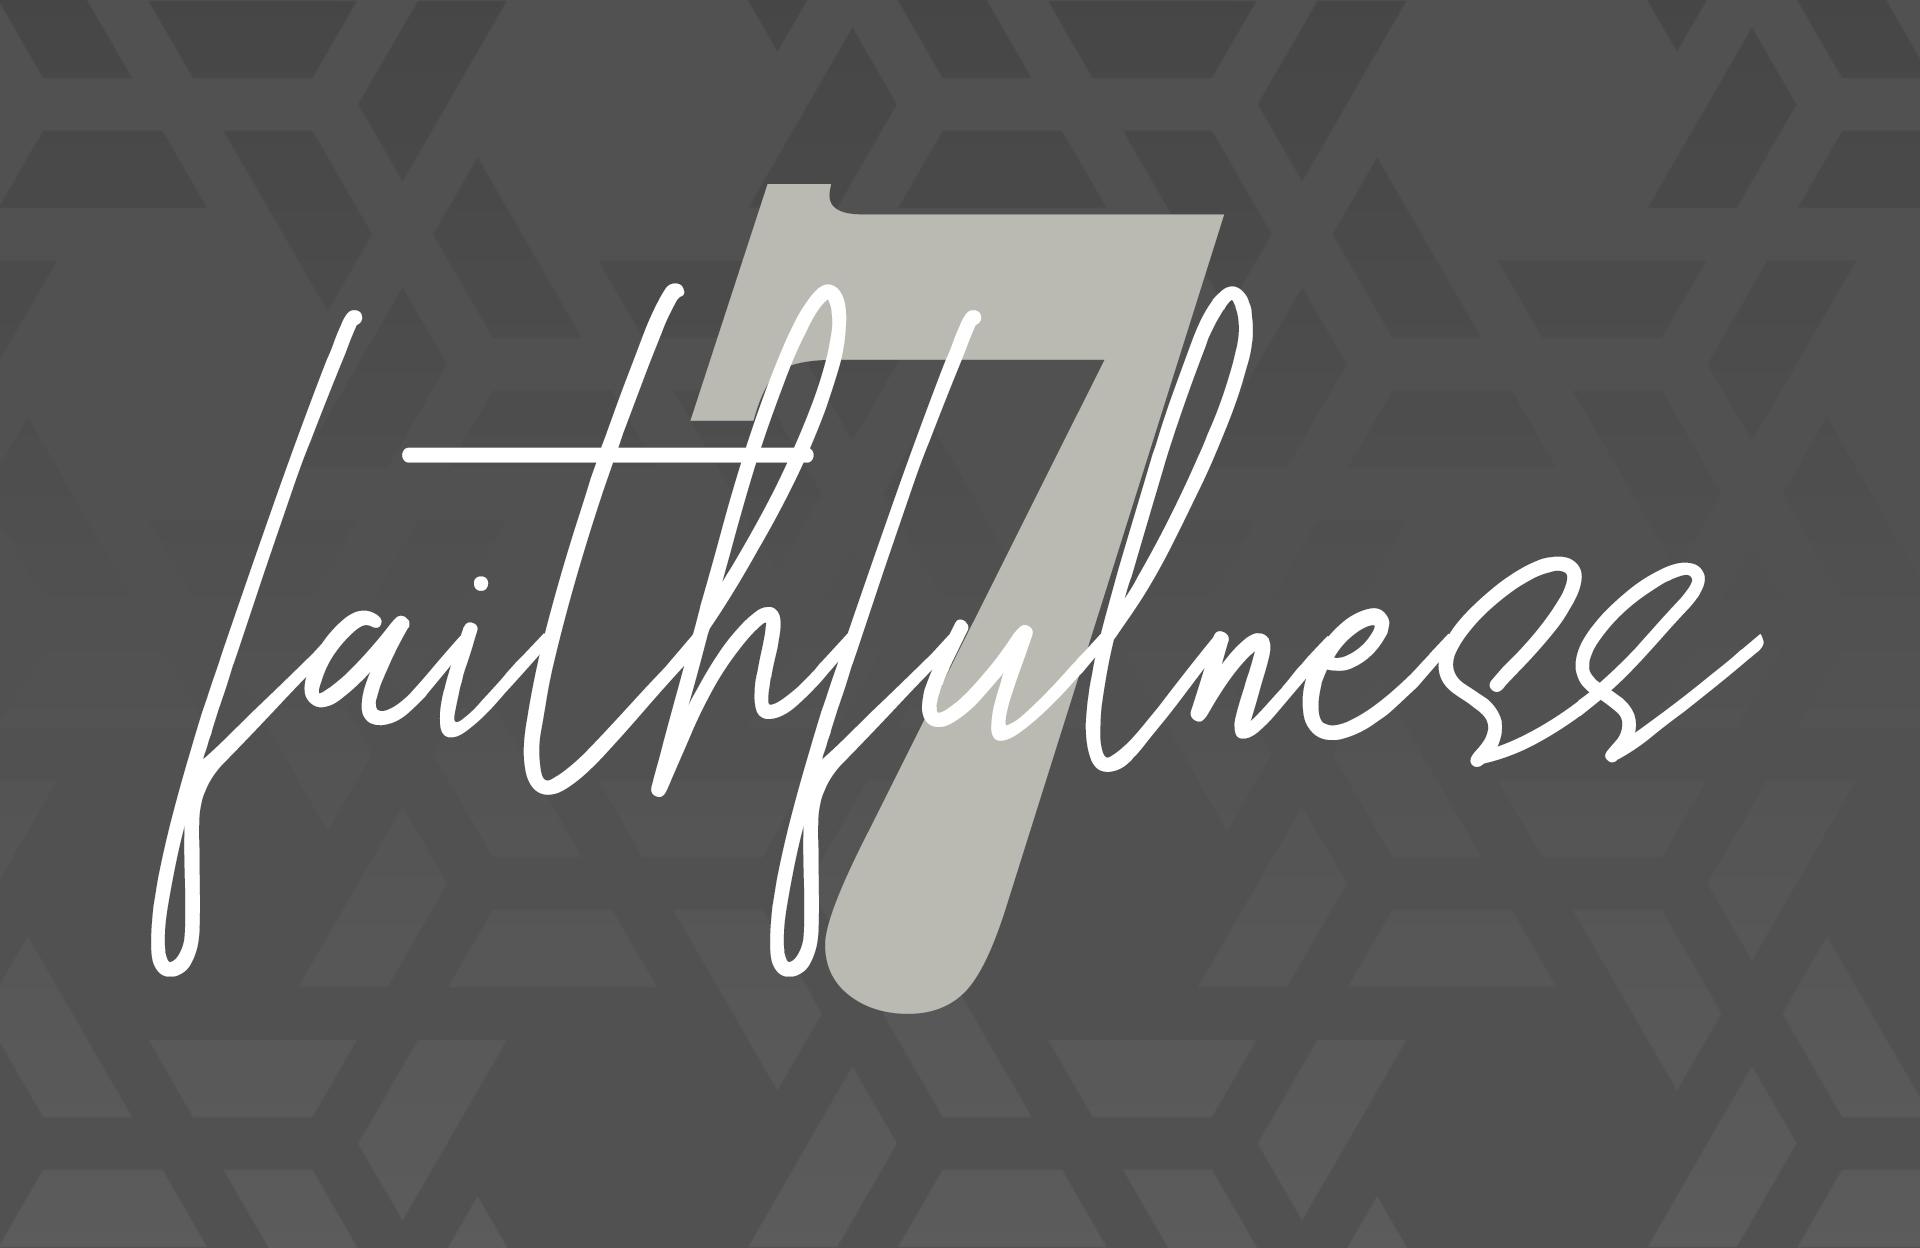 Day Seven: Faithfulness